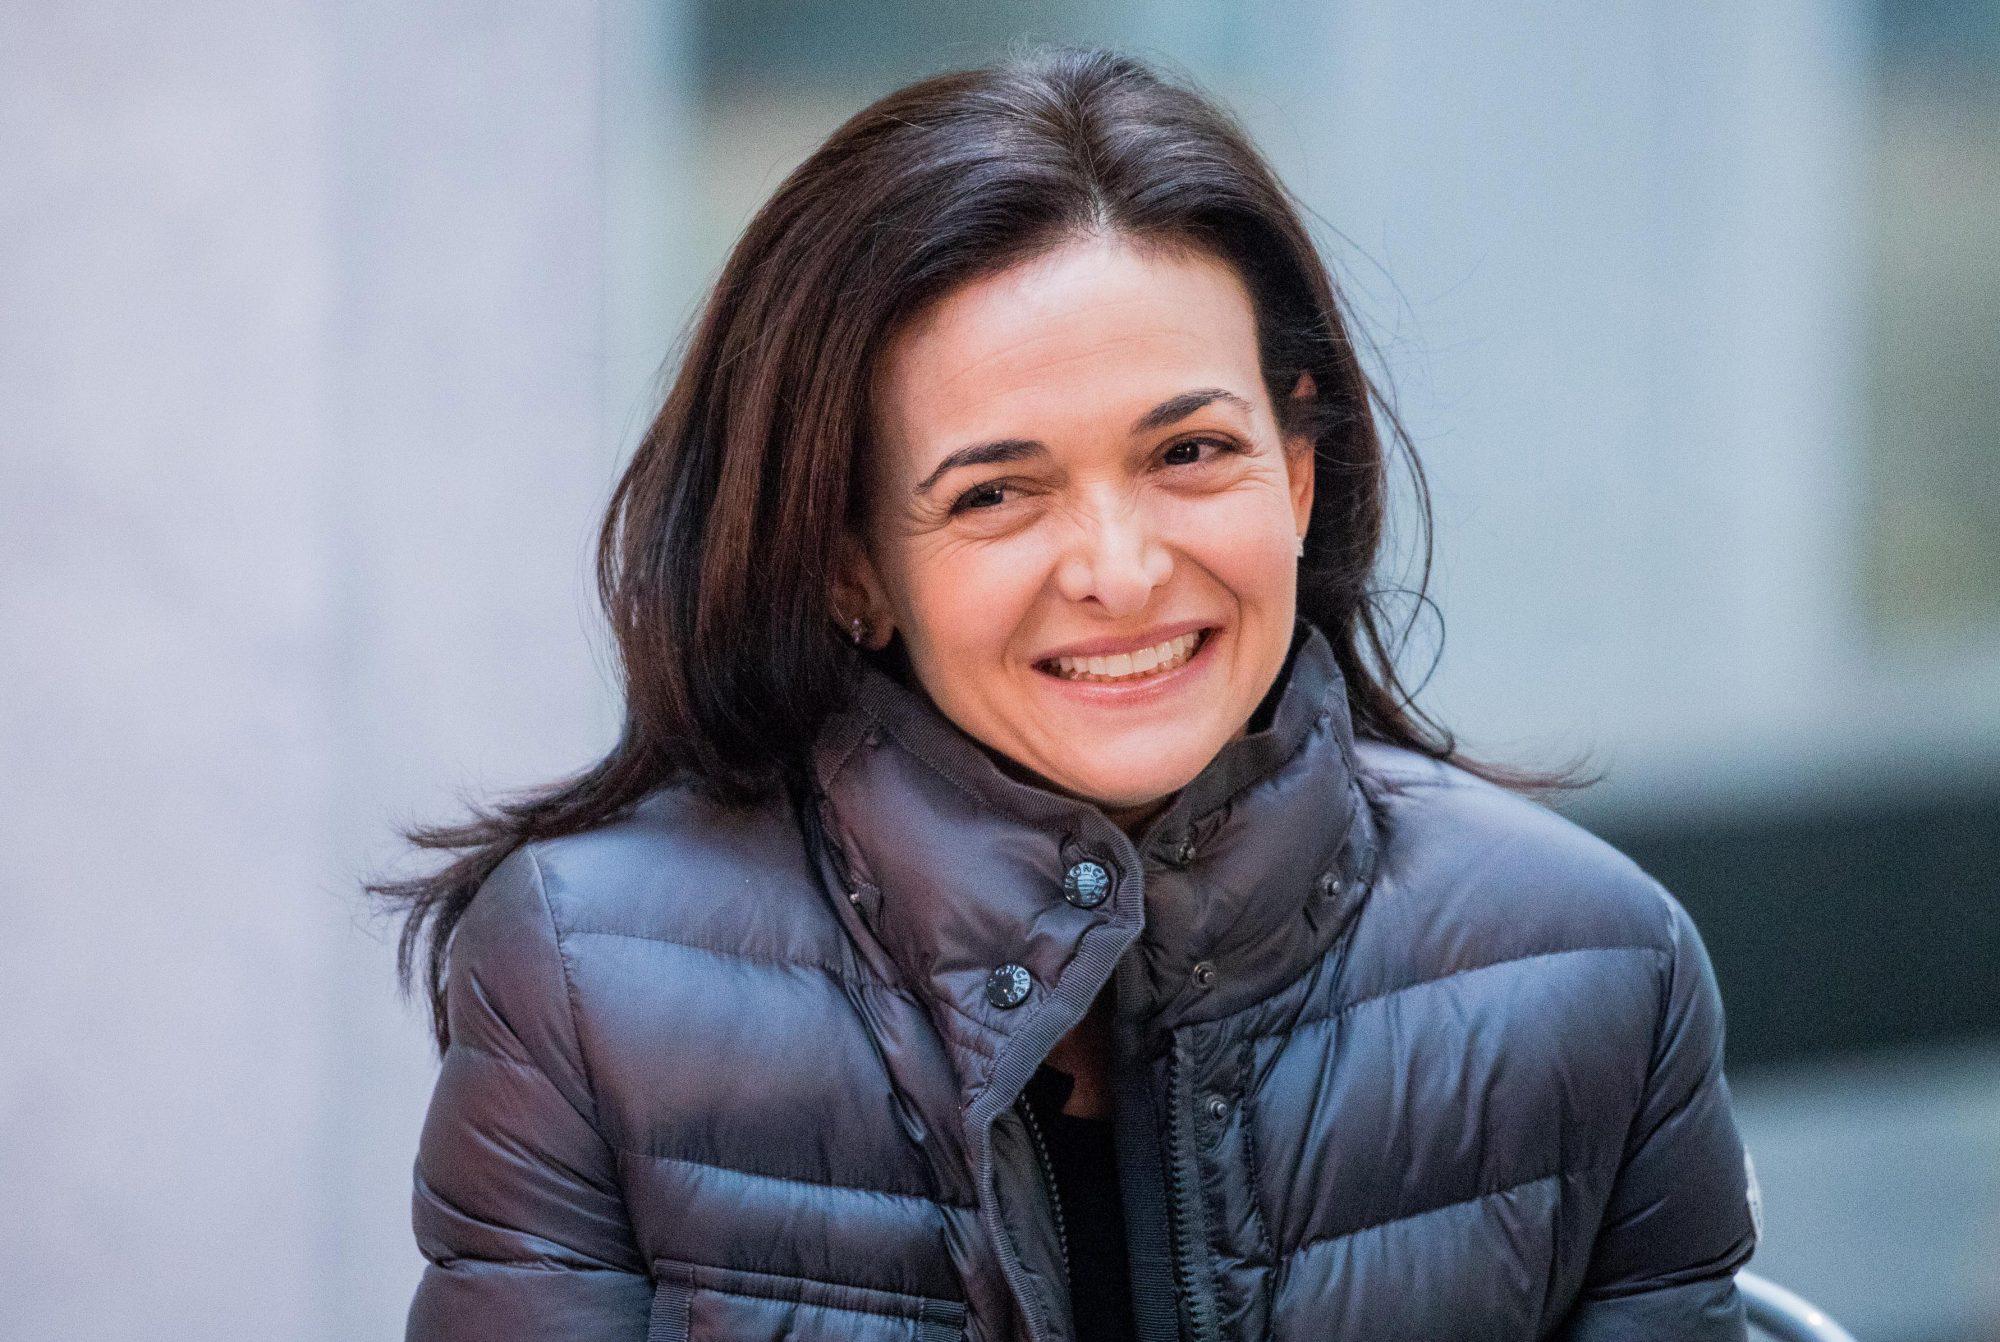 Facebook Inc. Chief Operating Officer Sheryl Sandberg Unveils Startup Garage